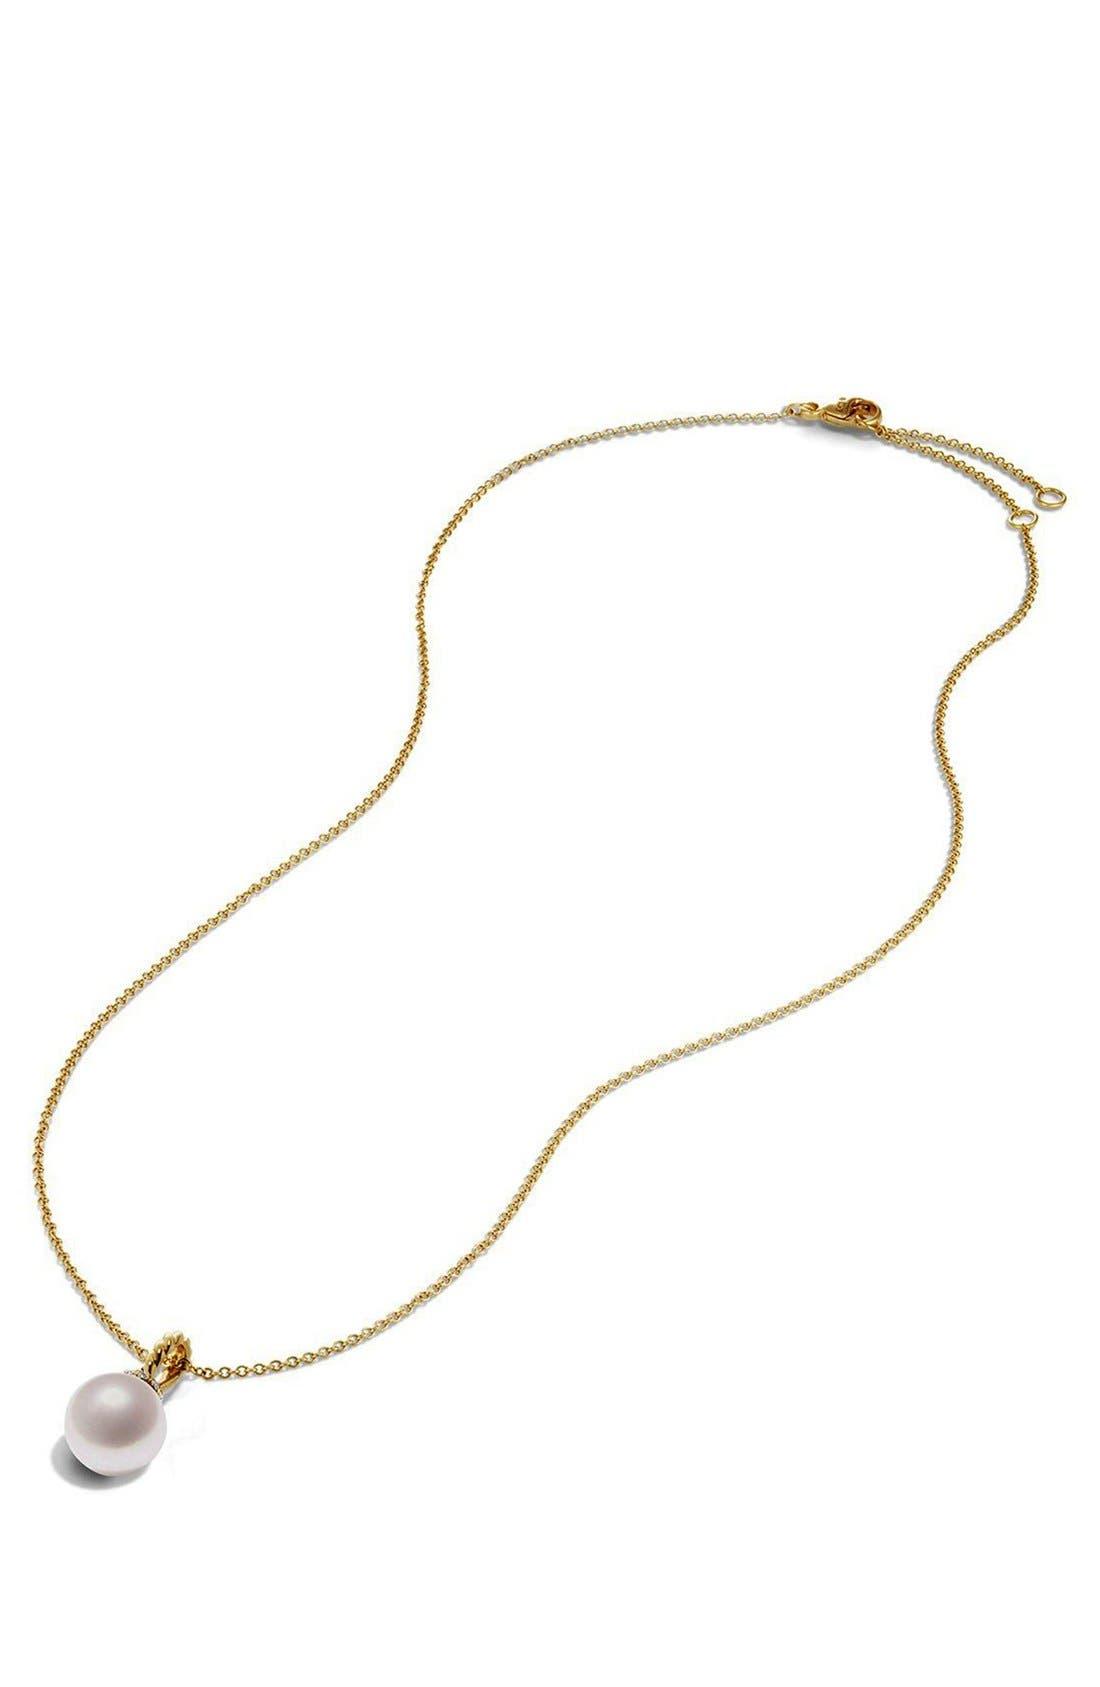 Alternate Image 2  - David Yurman 'Solari' Pendant Necklace with Pearls and Diamonds in 18K Gold